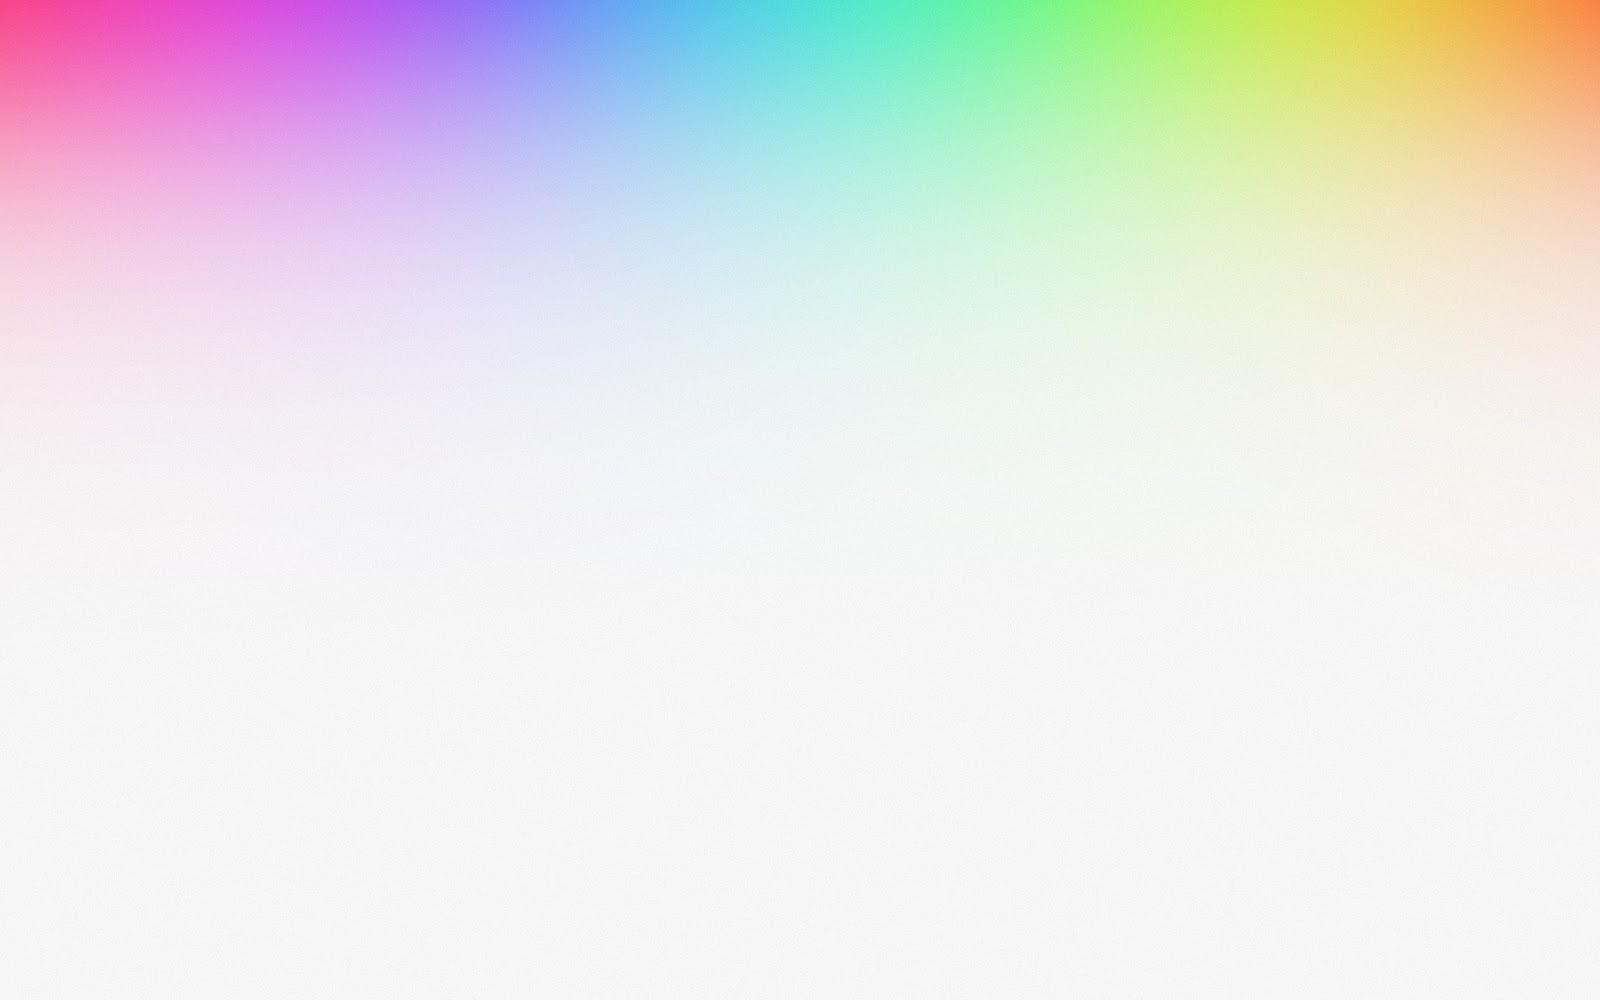 neon colors wallpaper